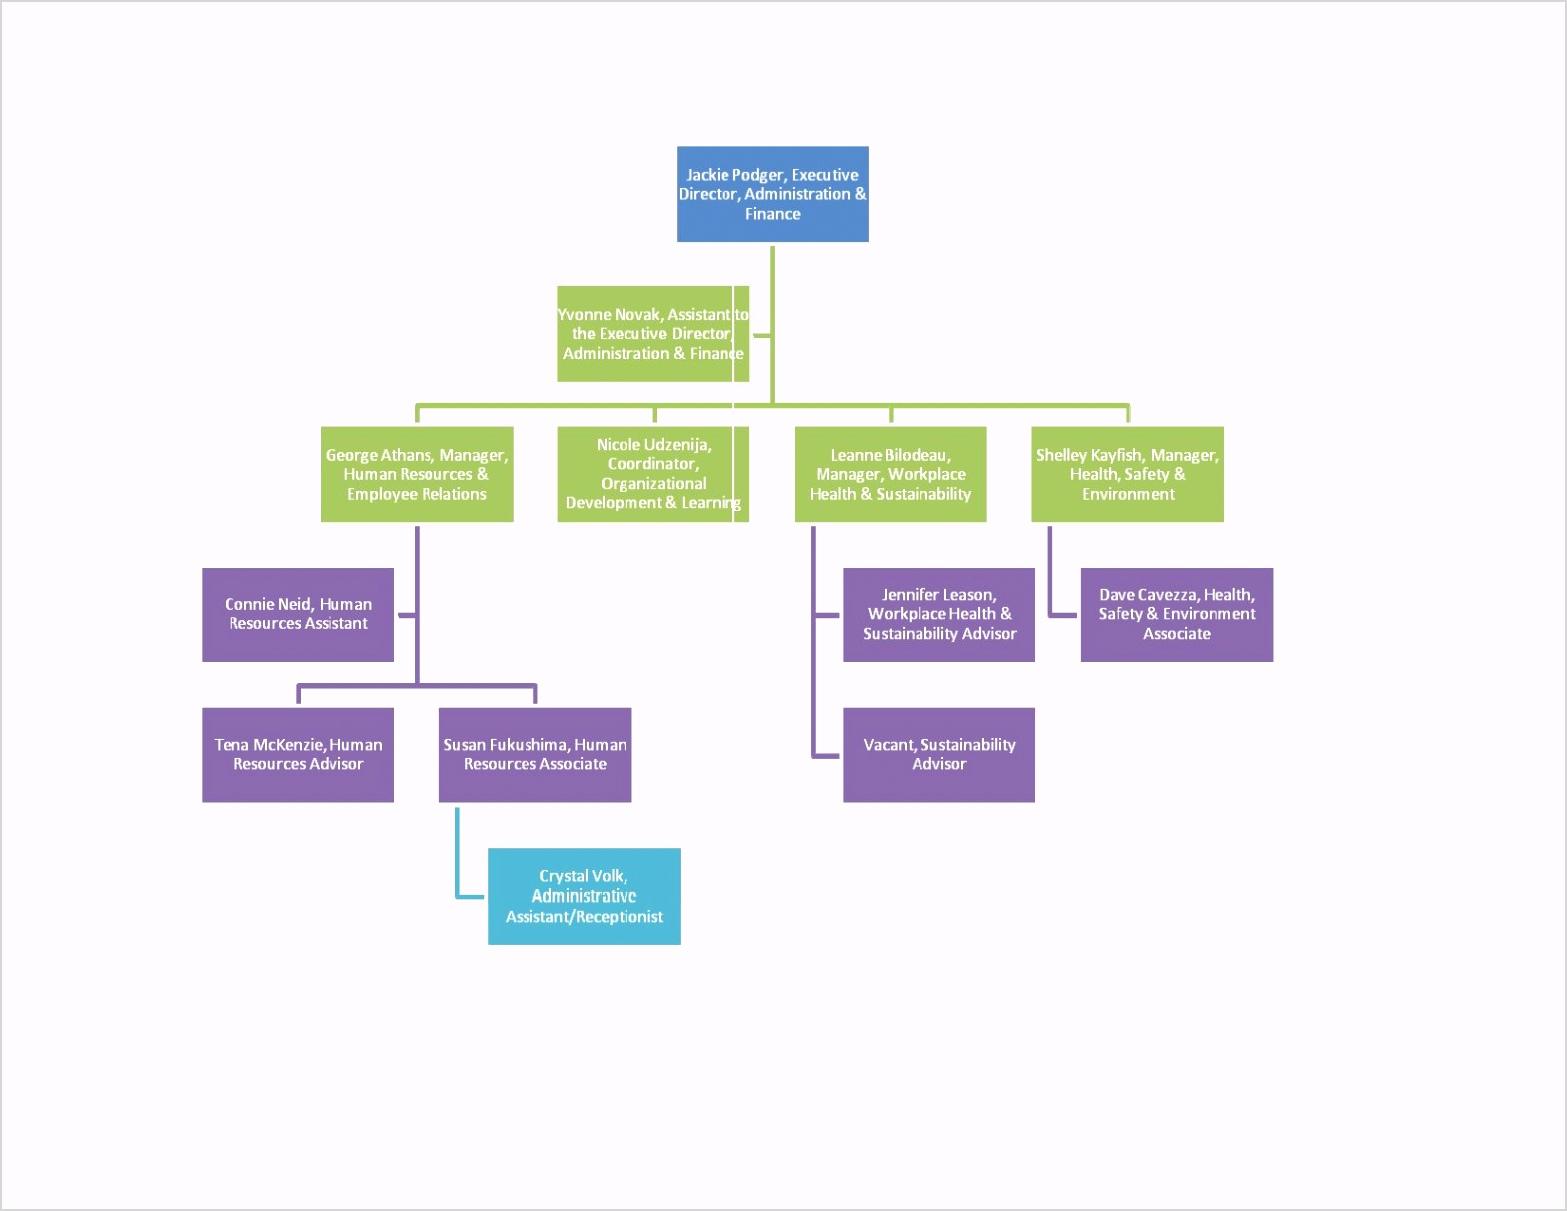 59 Organizational Chart Template Word 2013 pertaining